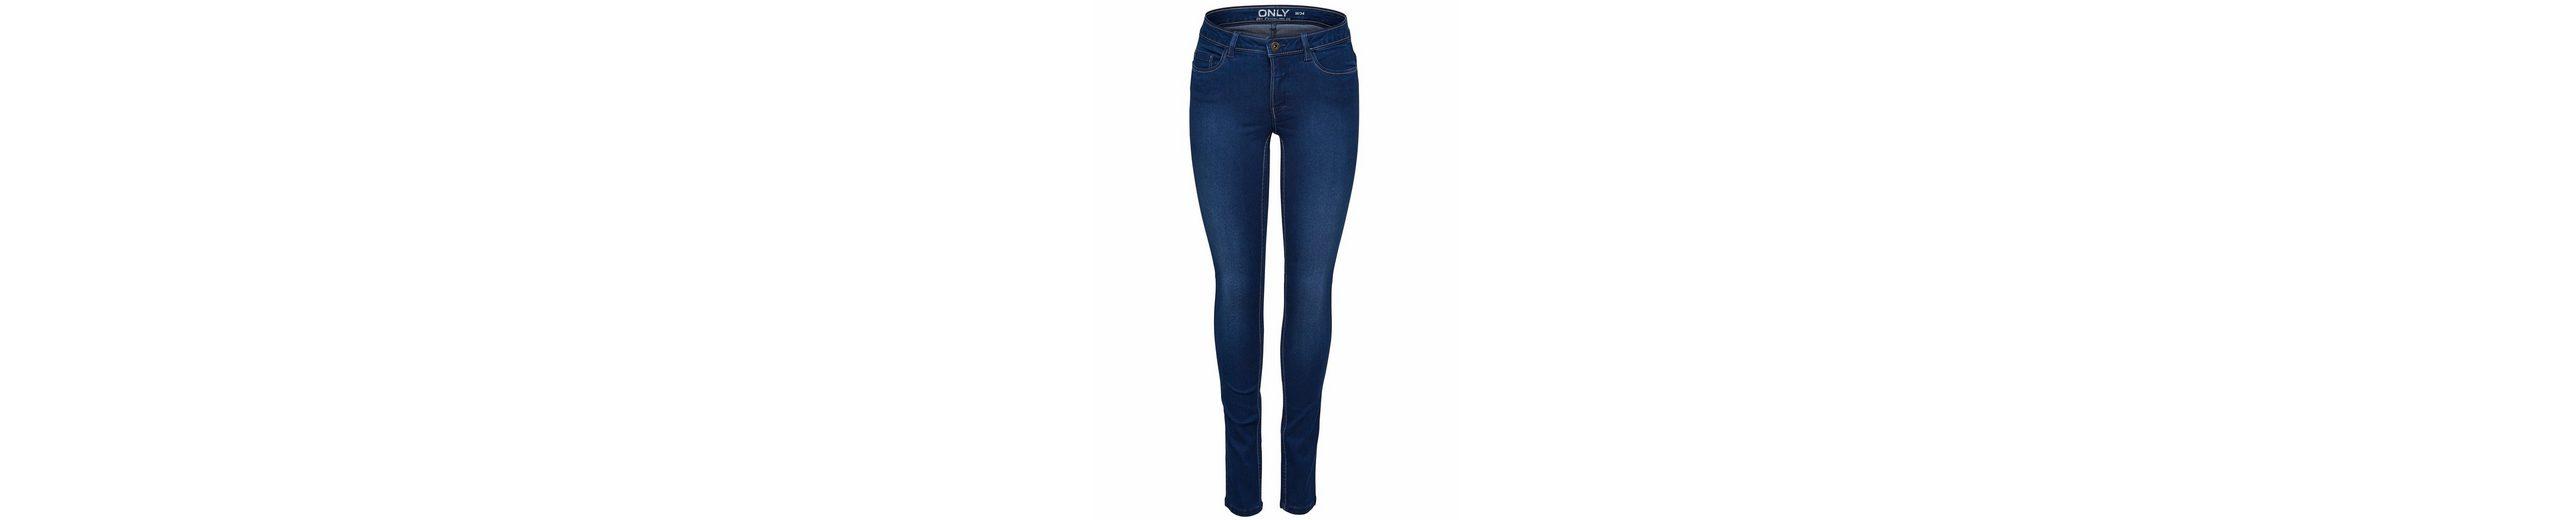 Billig Verkauf Der Neue Ankunft Only Skinny-fit-Jeans Rabatt Bester Platz Auslass Wiki Zuverlässig Günstiger Preis Auslass Freies Verschiffen OMhx0z